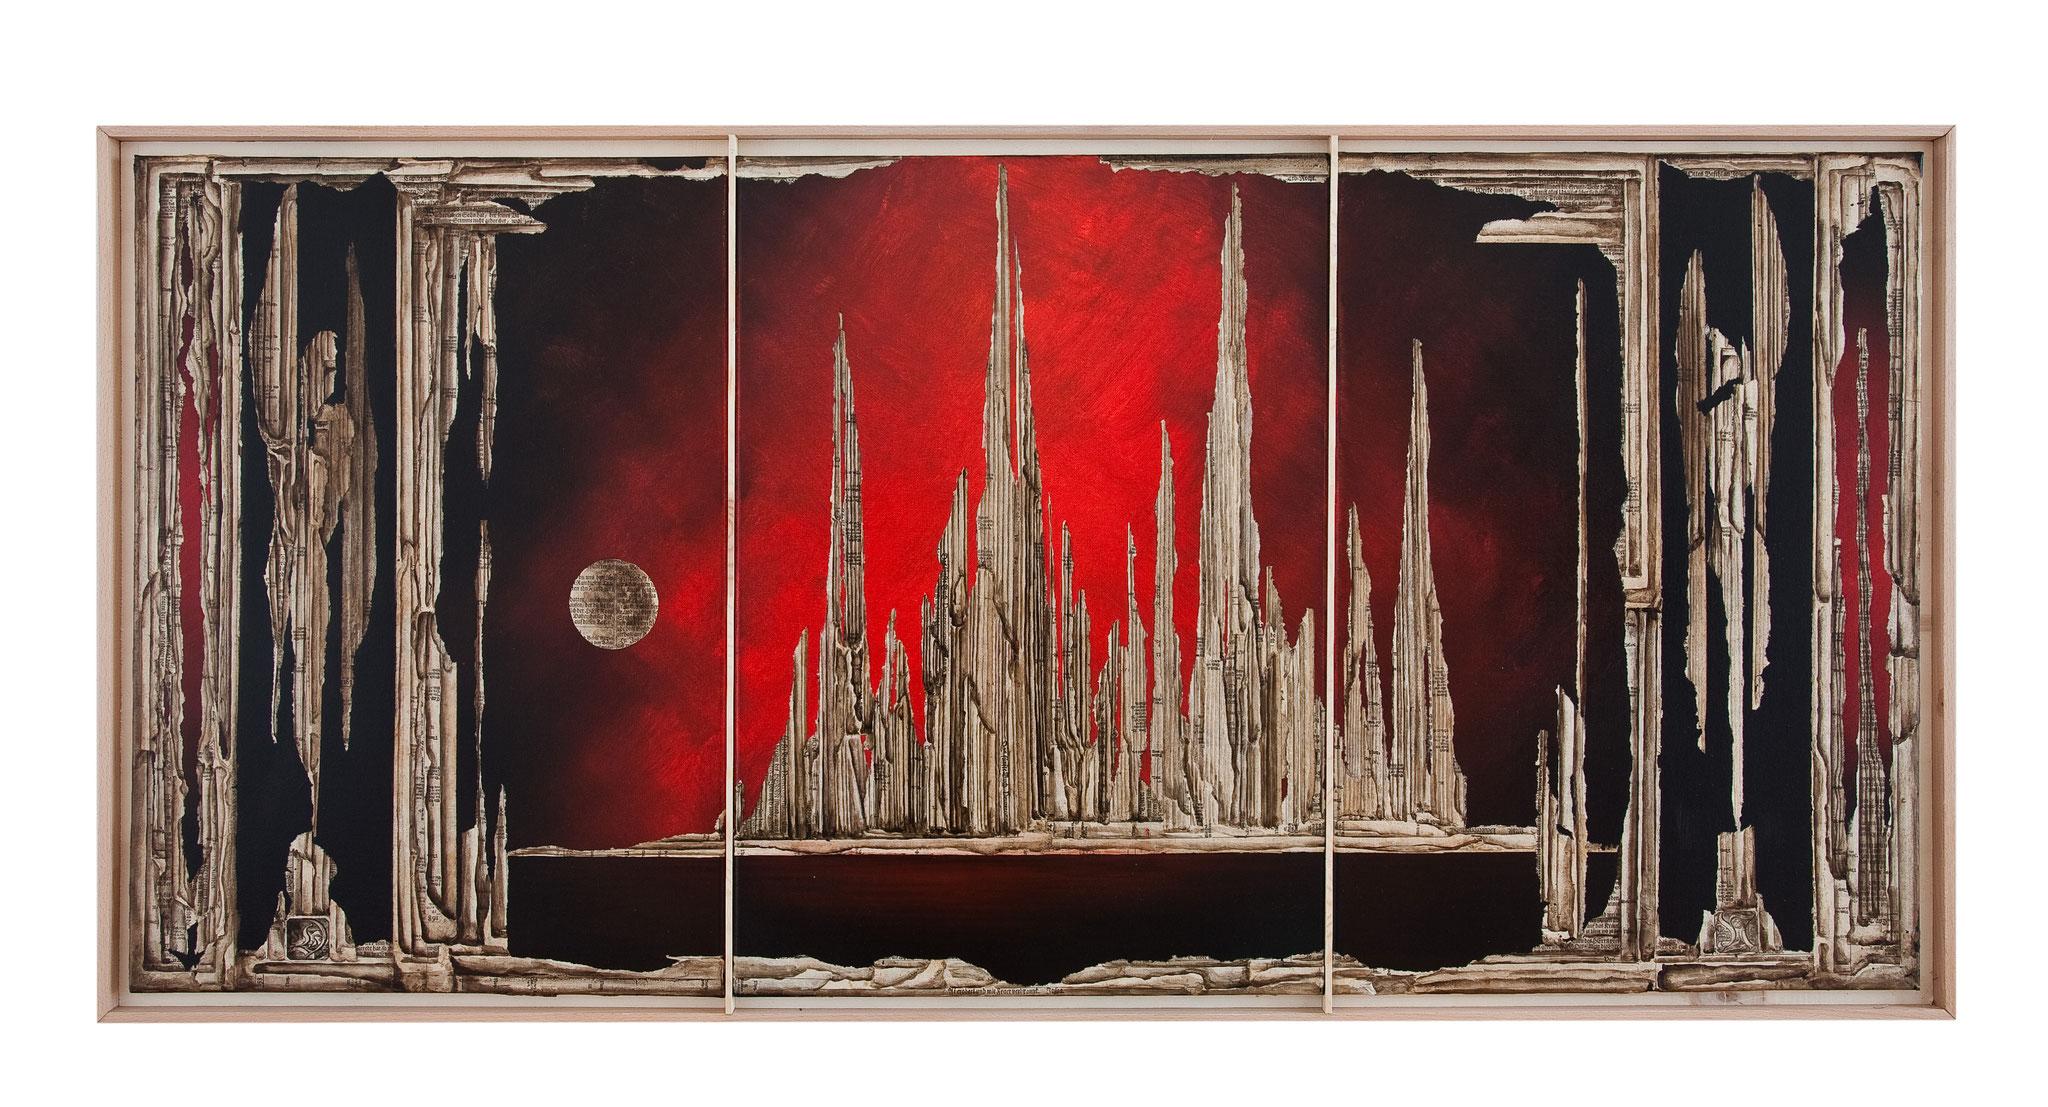 AI BRENNT - 2014 - Acryl, Tusche, Papier auf Leinwand  - 75 x157 cm